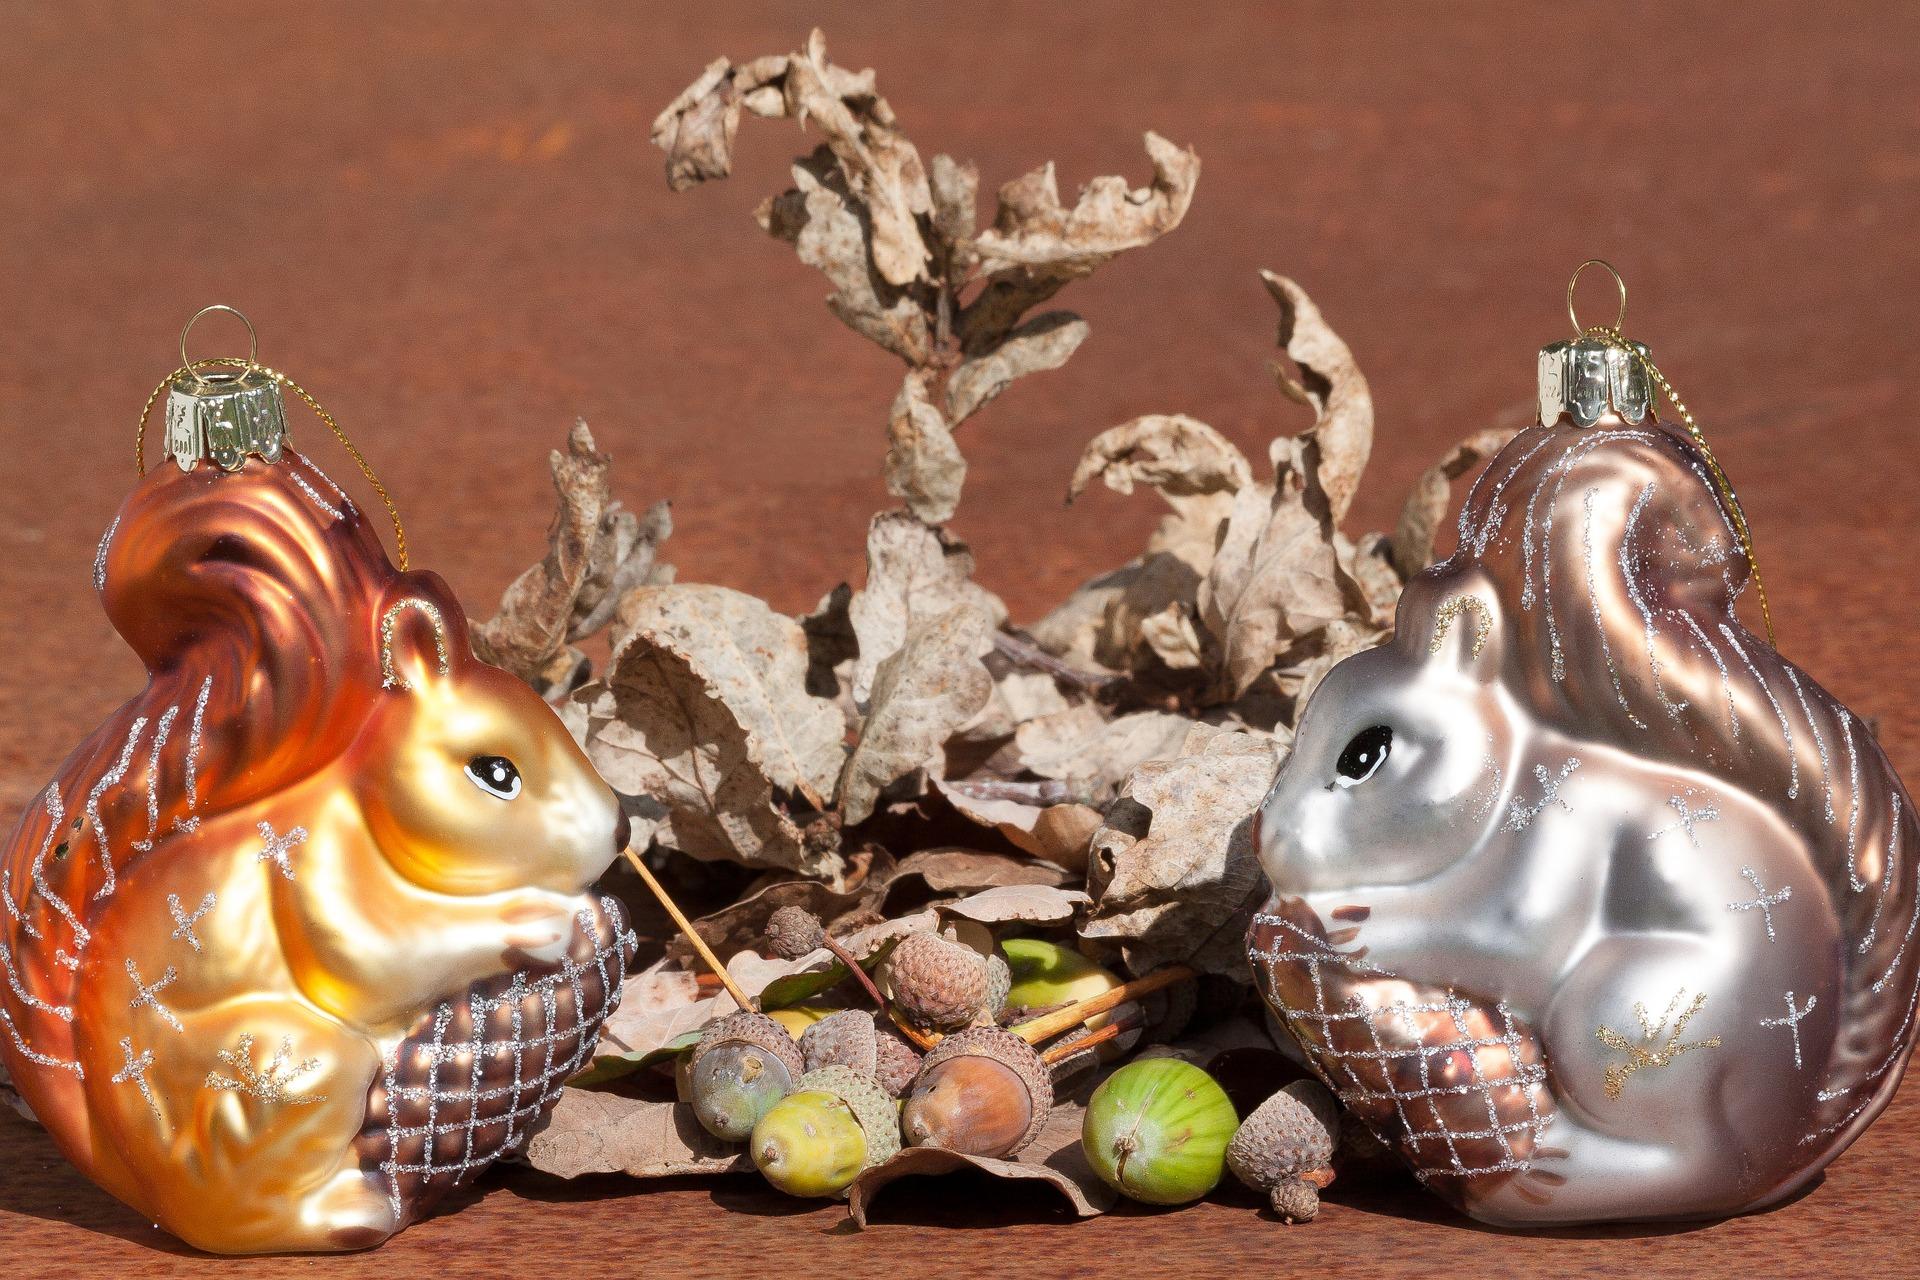 Squirrel Figure, Figure, Nut, Object, Squirrel, HQ Photo